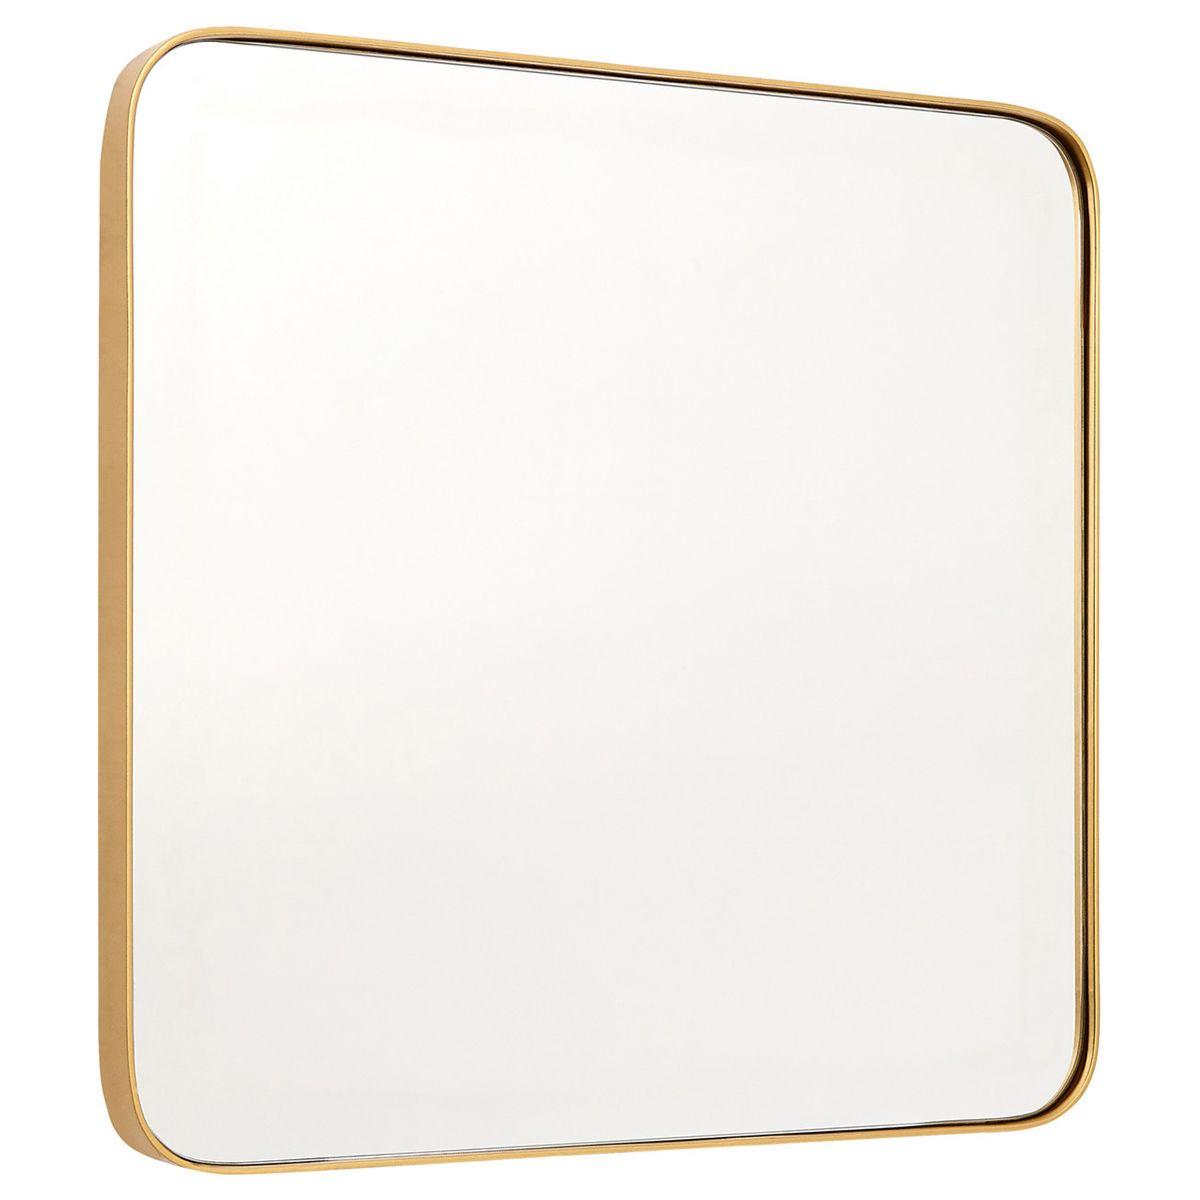 Small Square Wall Mirror - Gold Finish